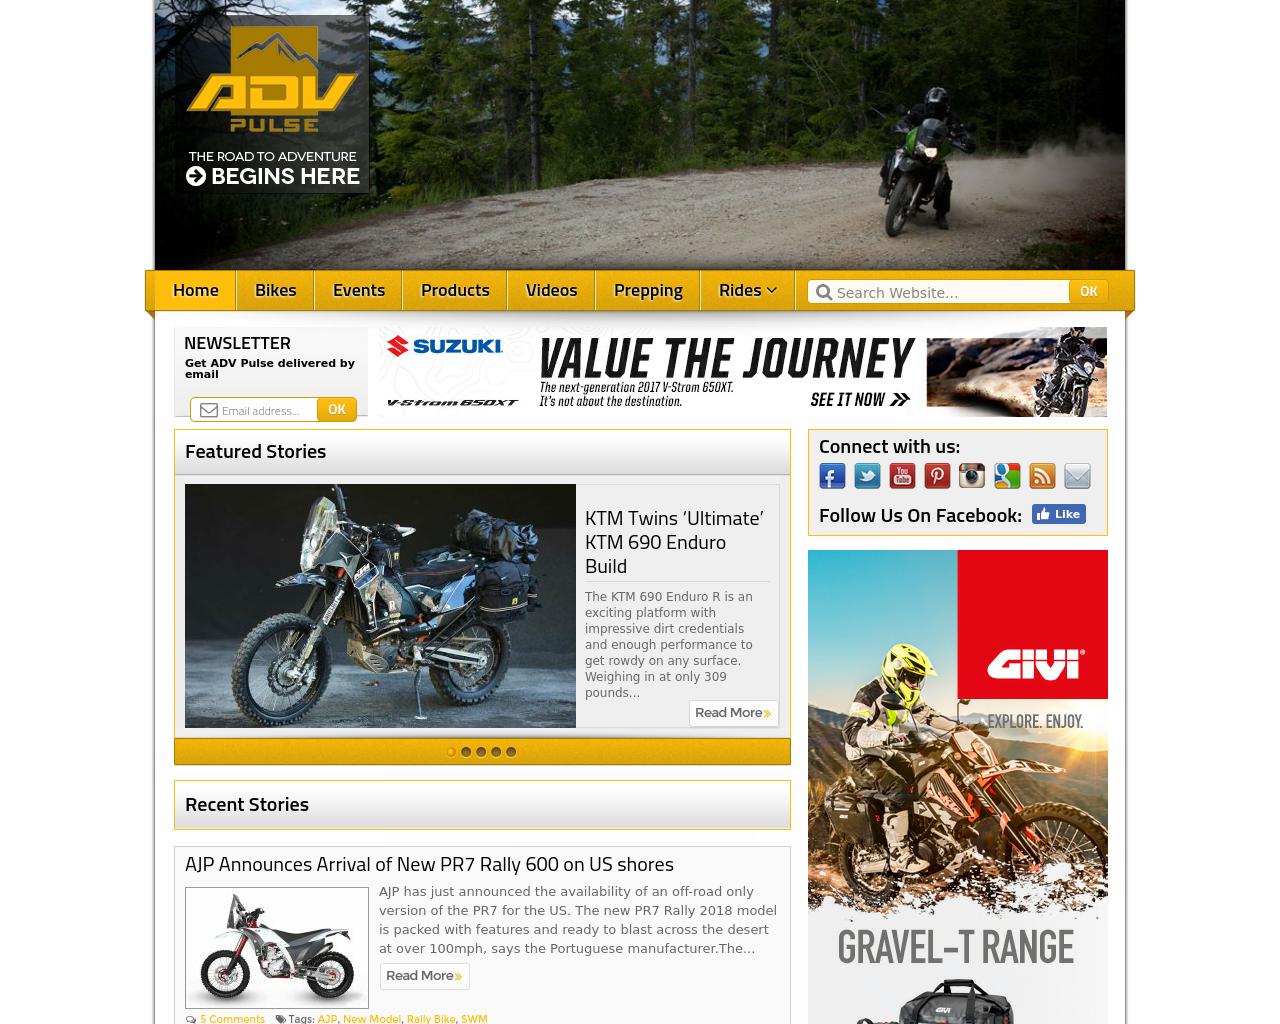 ADV-Pulse-Advertising-Reviews-Pricing